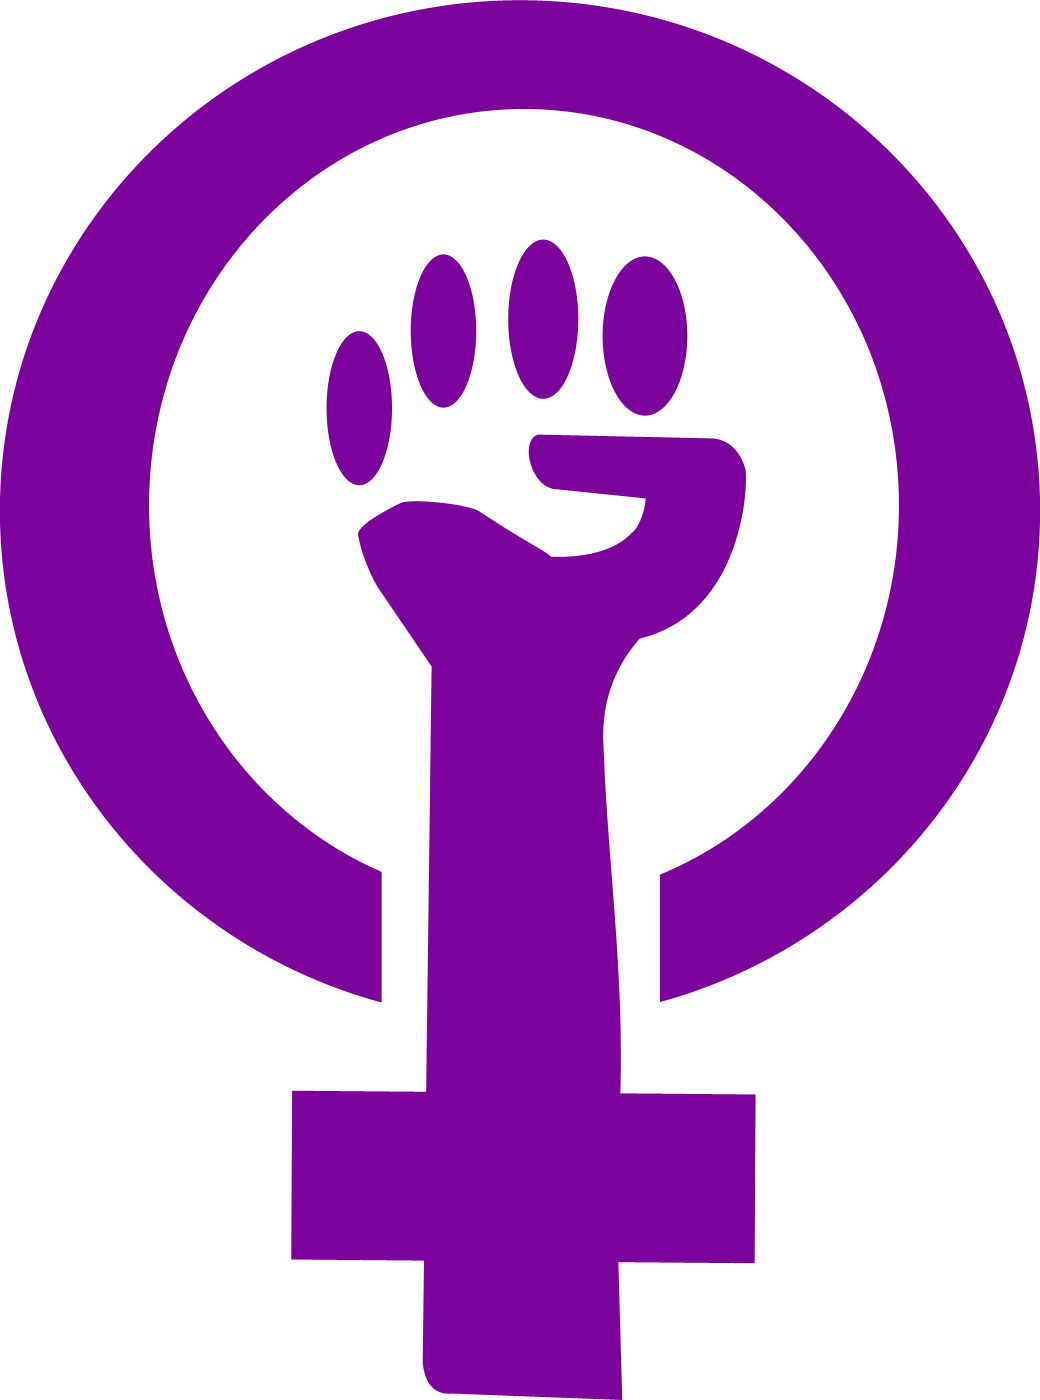 La revolución será feminista o no será nada